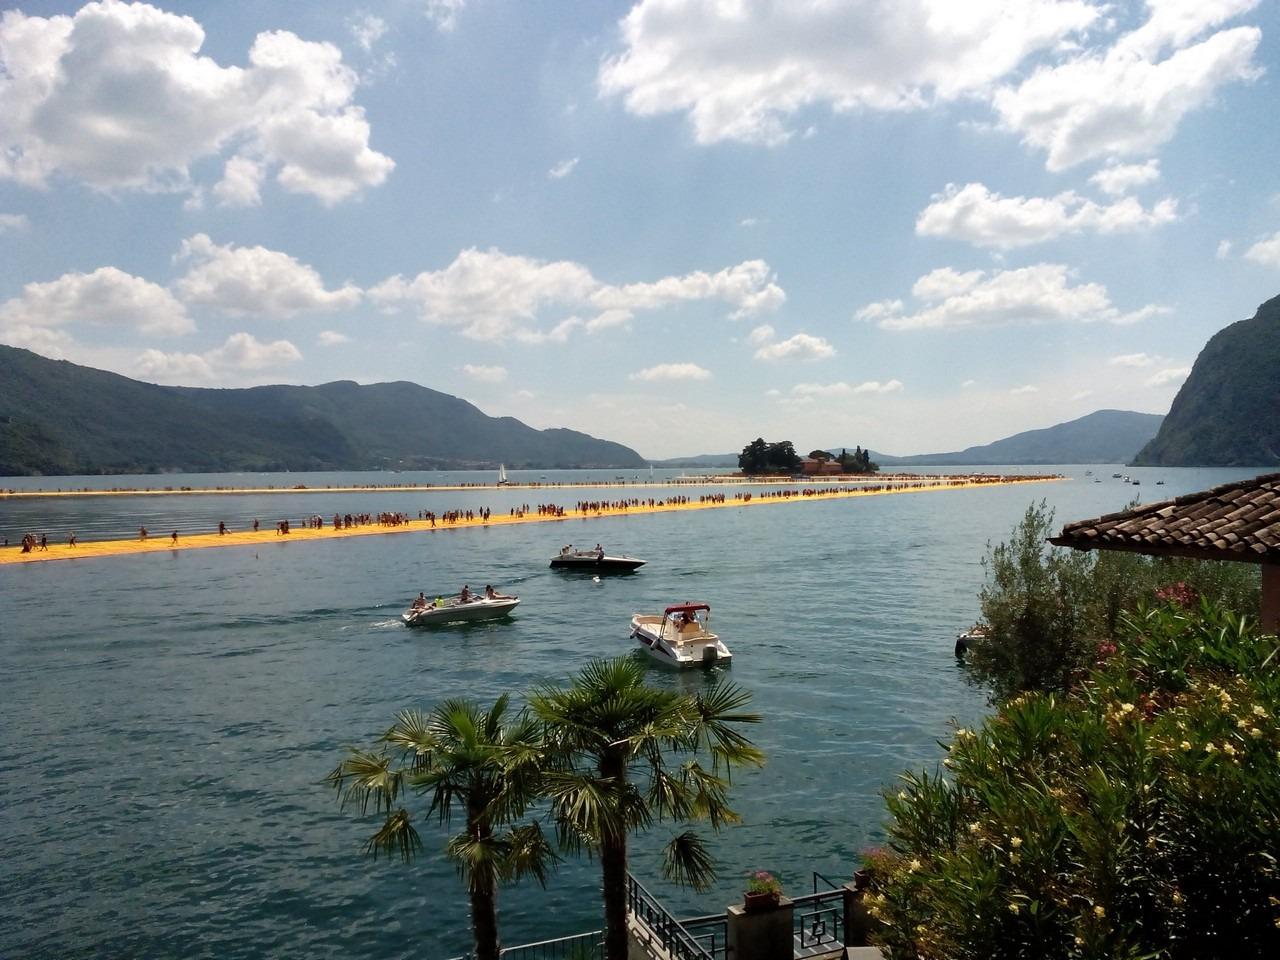 [cml_media_alt id='7811']The Floating Piers - Il ponte galleggiante sul Lago d'Iseo[/cml_media_alt]